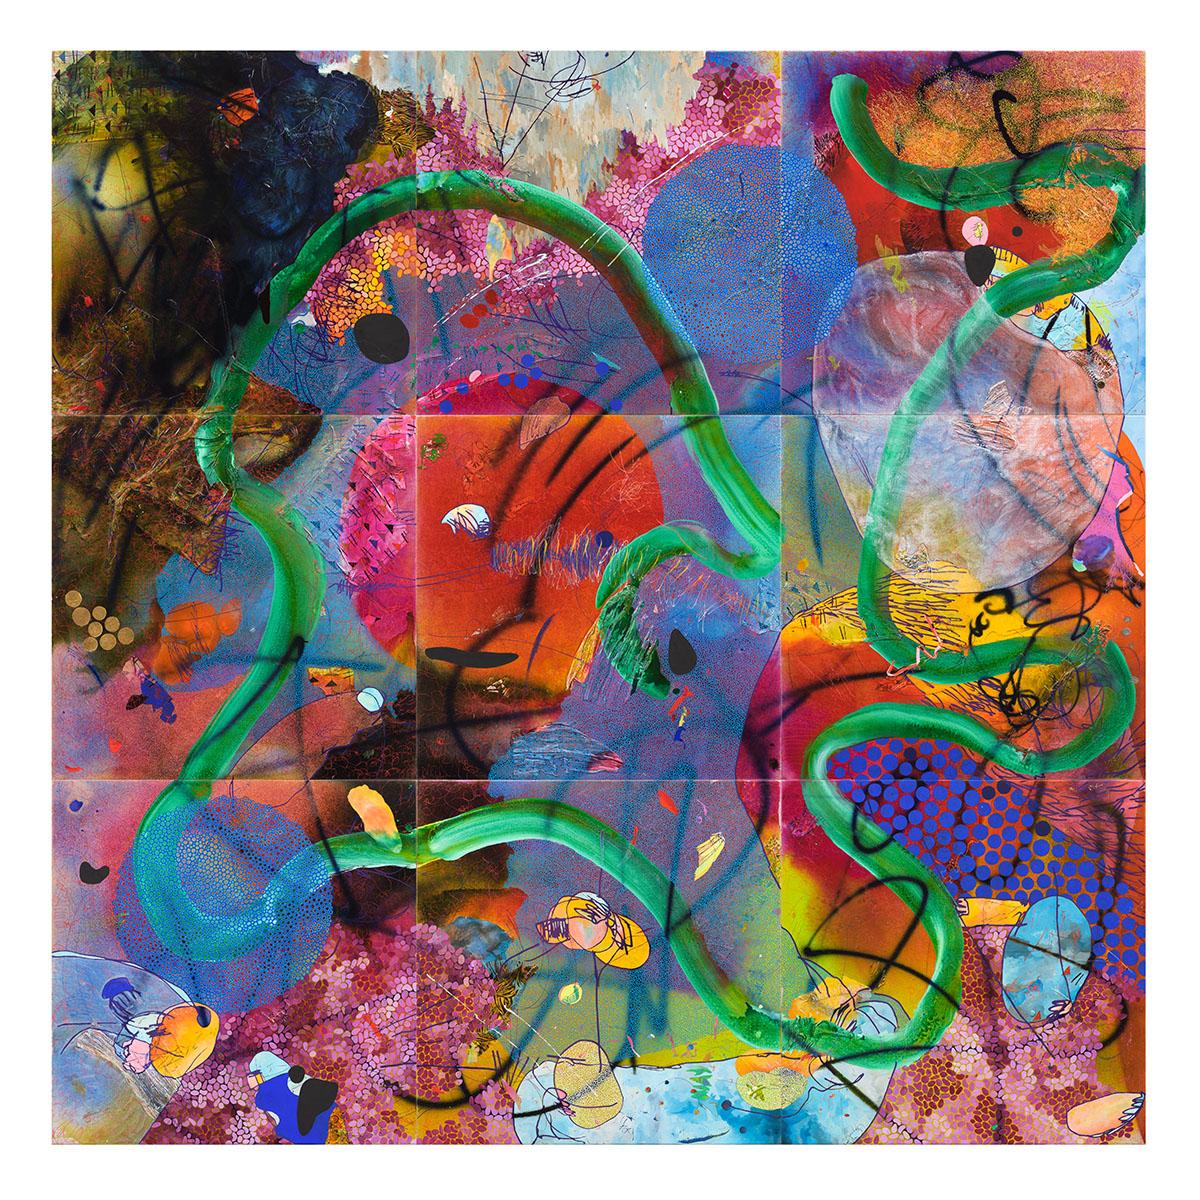 Evan Woodruffe, April-June 2017, 9 panels each 100cm x 100cm, acrylic, fabric and paper on linen. Image Sait Akkirman..jpg